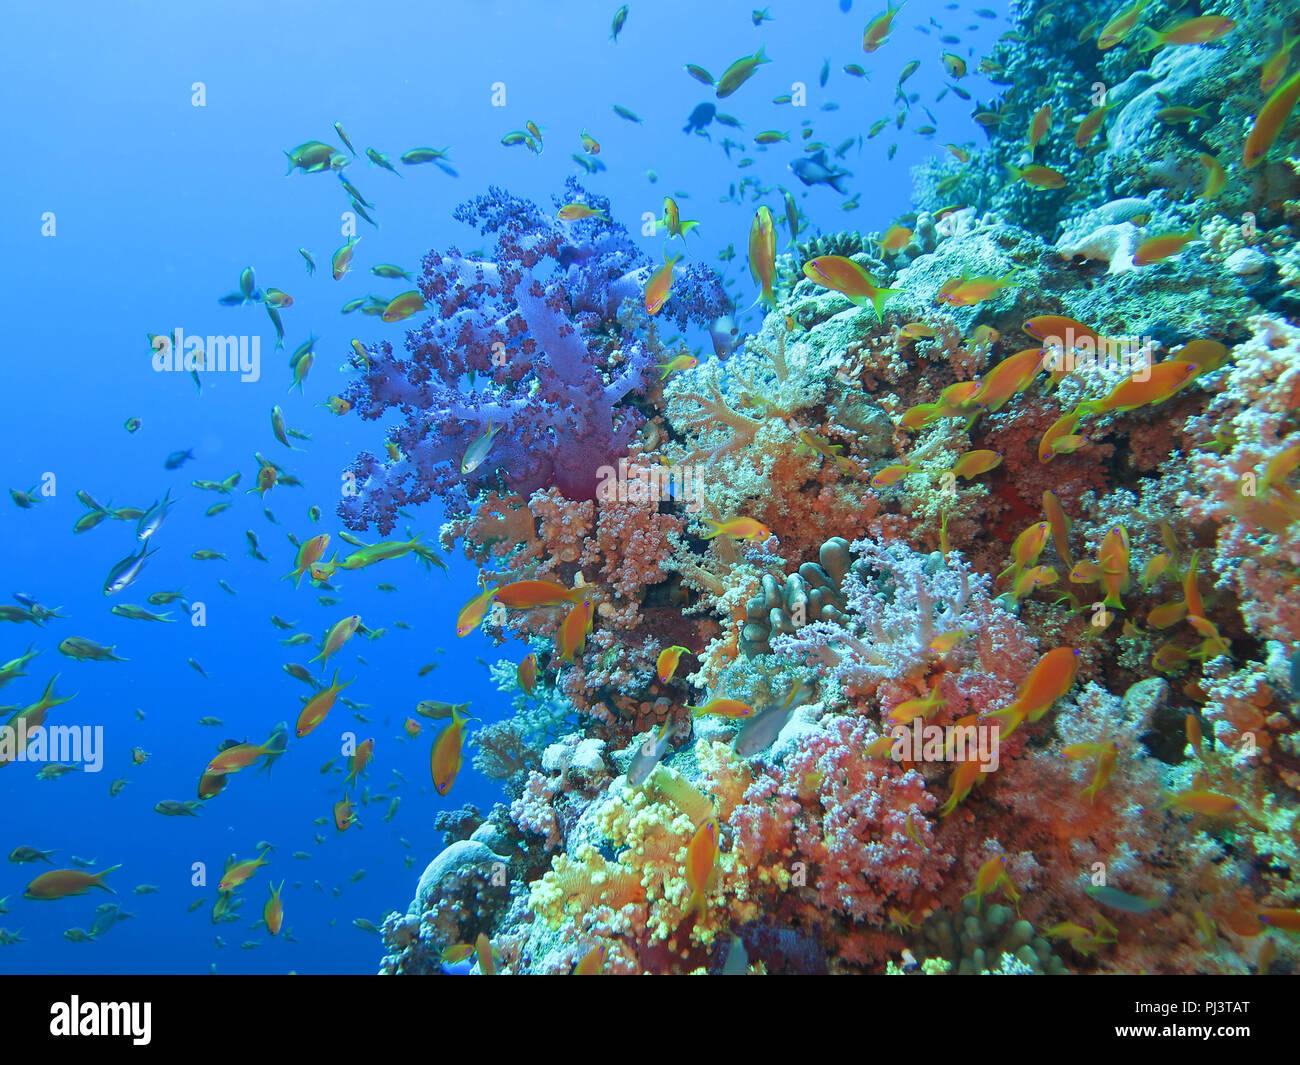 Korallenriff, Ras Mohammed, Shark Reef, Sinai, Rotes Meer, Aegypten - Stock Image